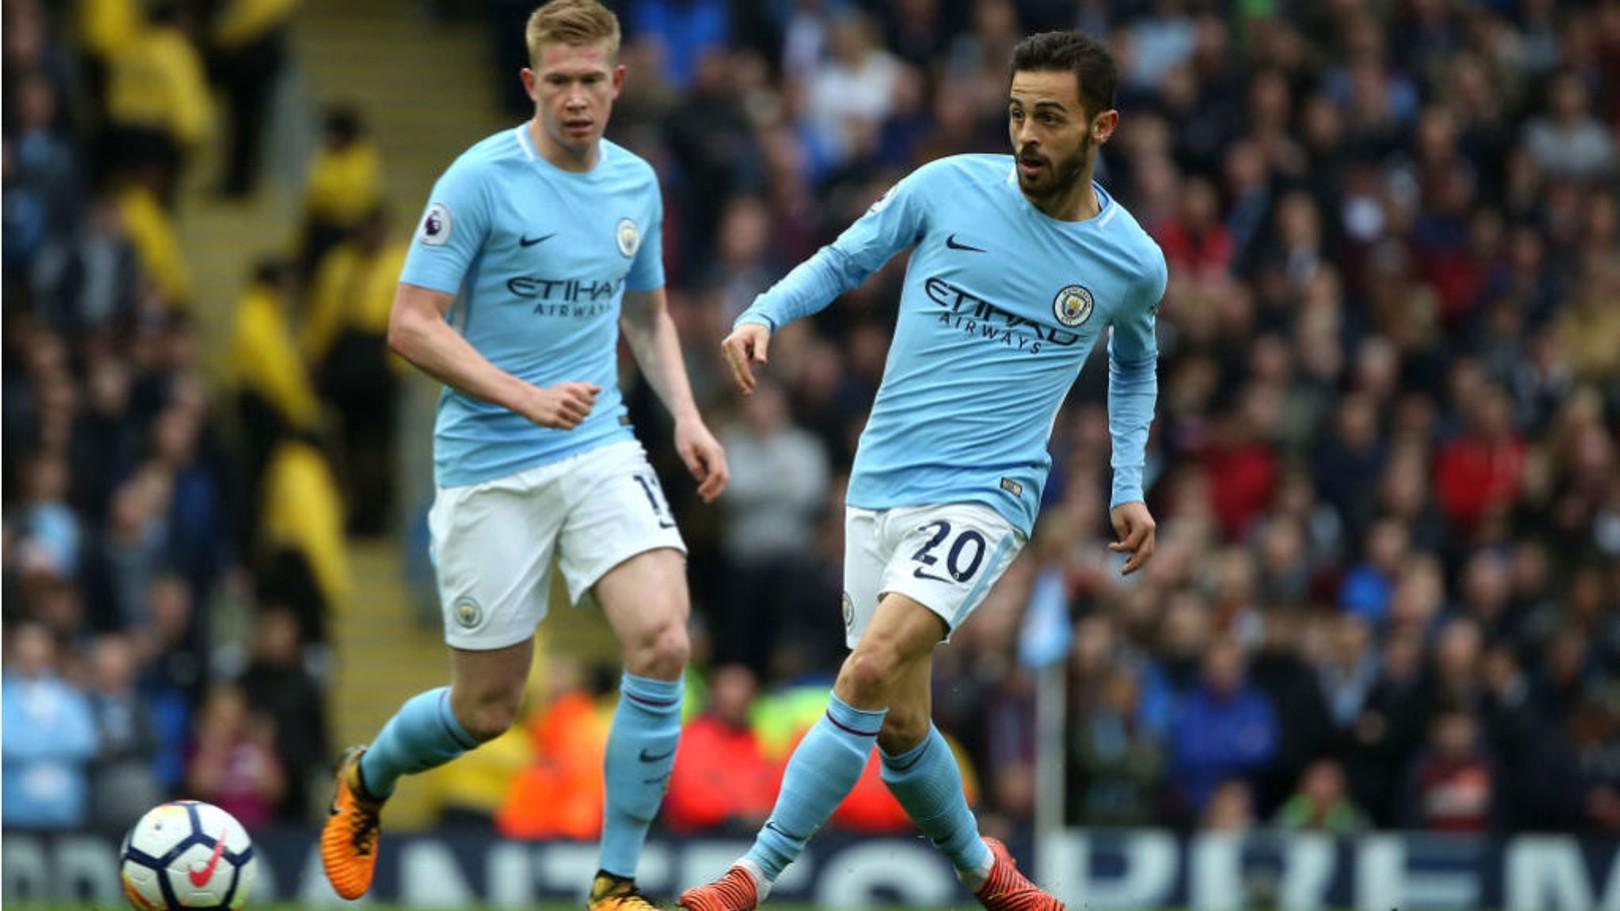 SOLID SILVA: Bernardo Silva looks to open up the Burnley defence